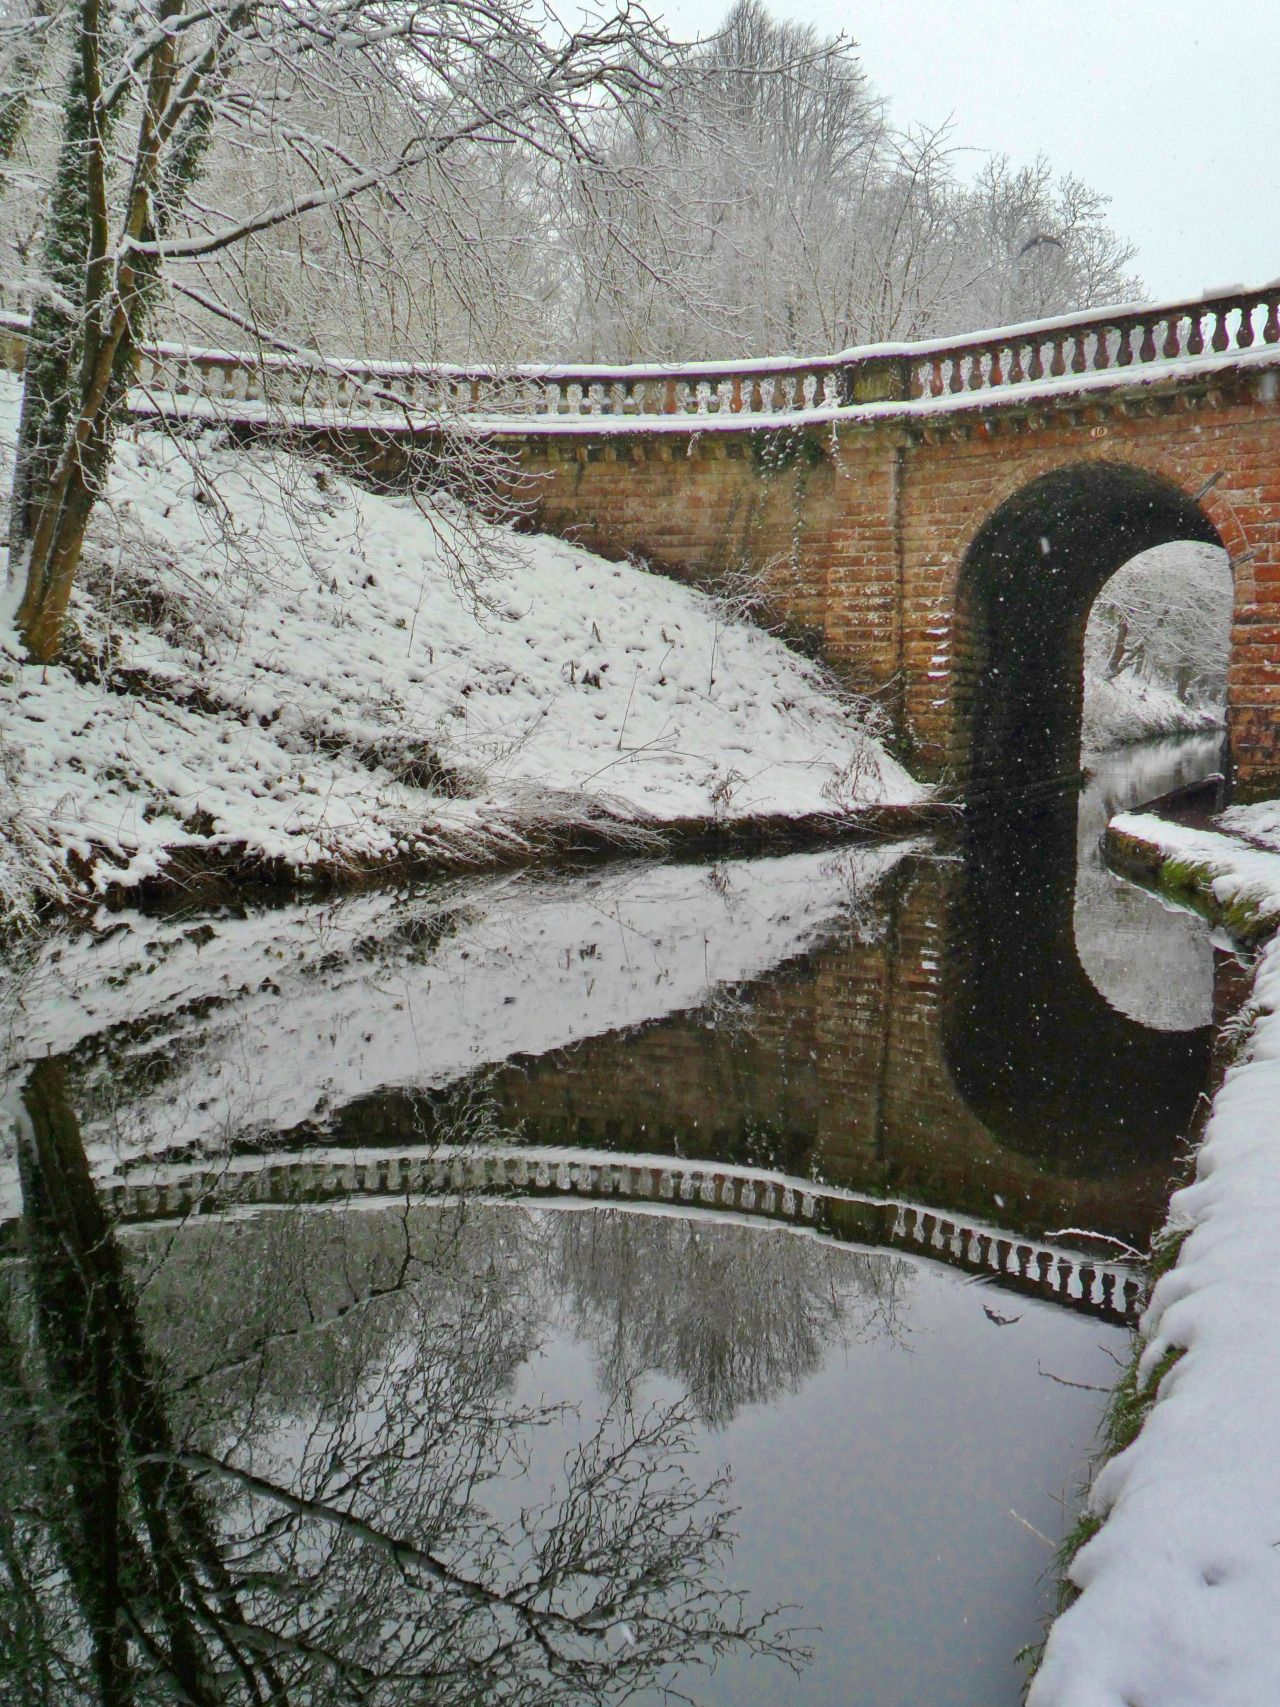 "vwcampervan-aldridge: "" Snow falls over the Bridge to Chillington Hall, Brewood, Staffordshire, England All Original Photography by http://vwcampervan-aldridge.tumblr.com """